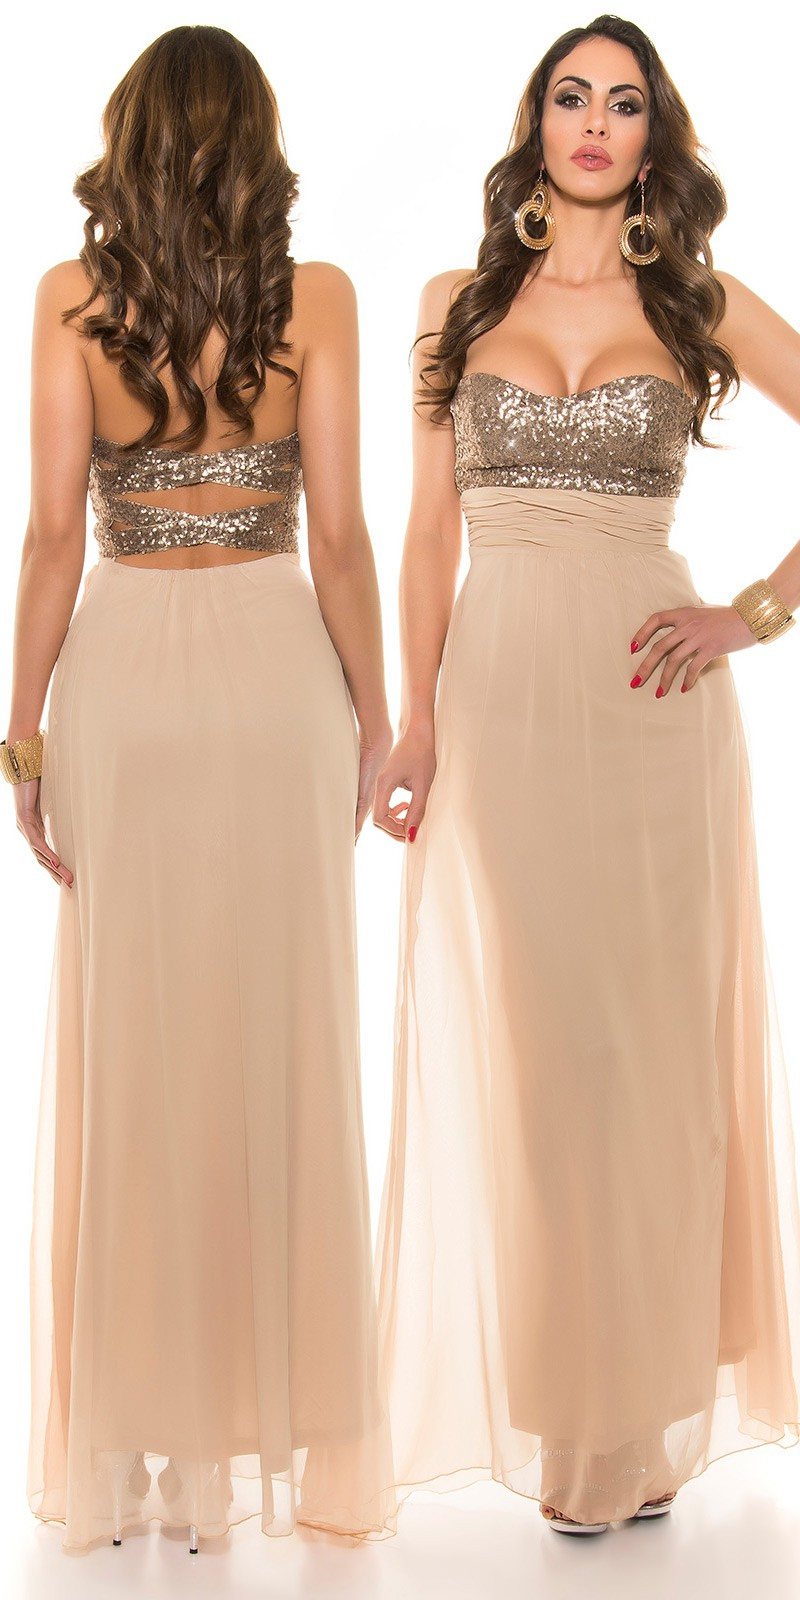 900c5c544016 Plesové šaty - IF 50550 - béžové